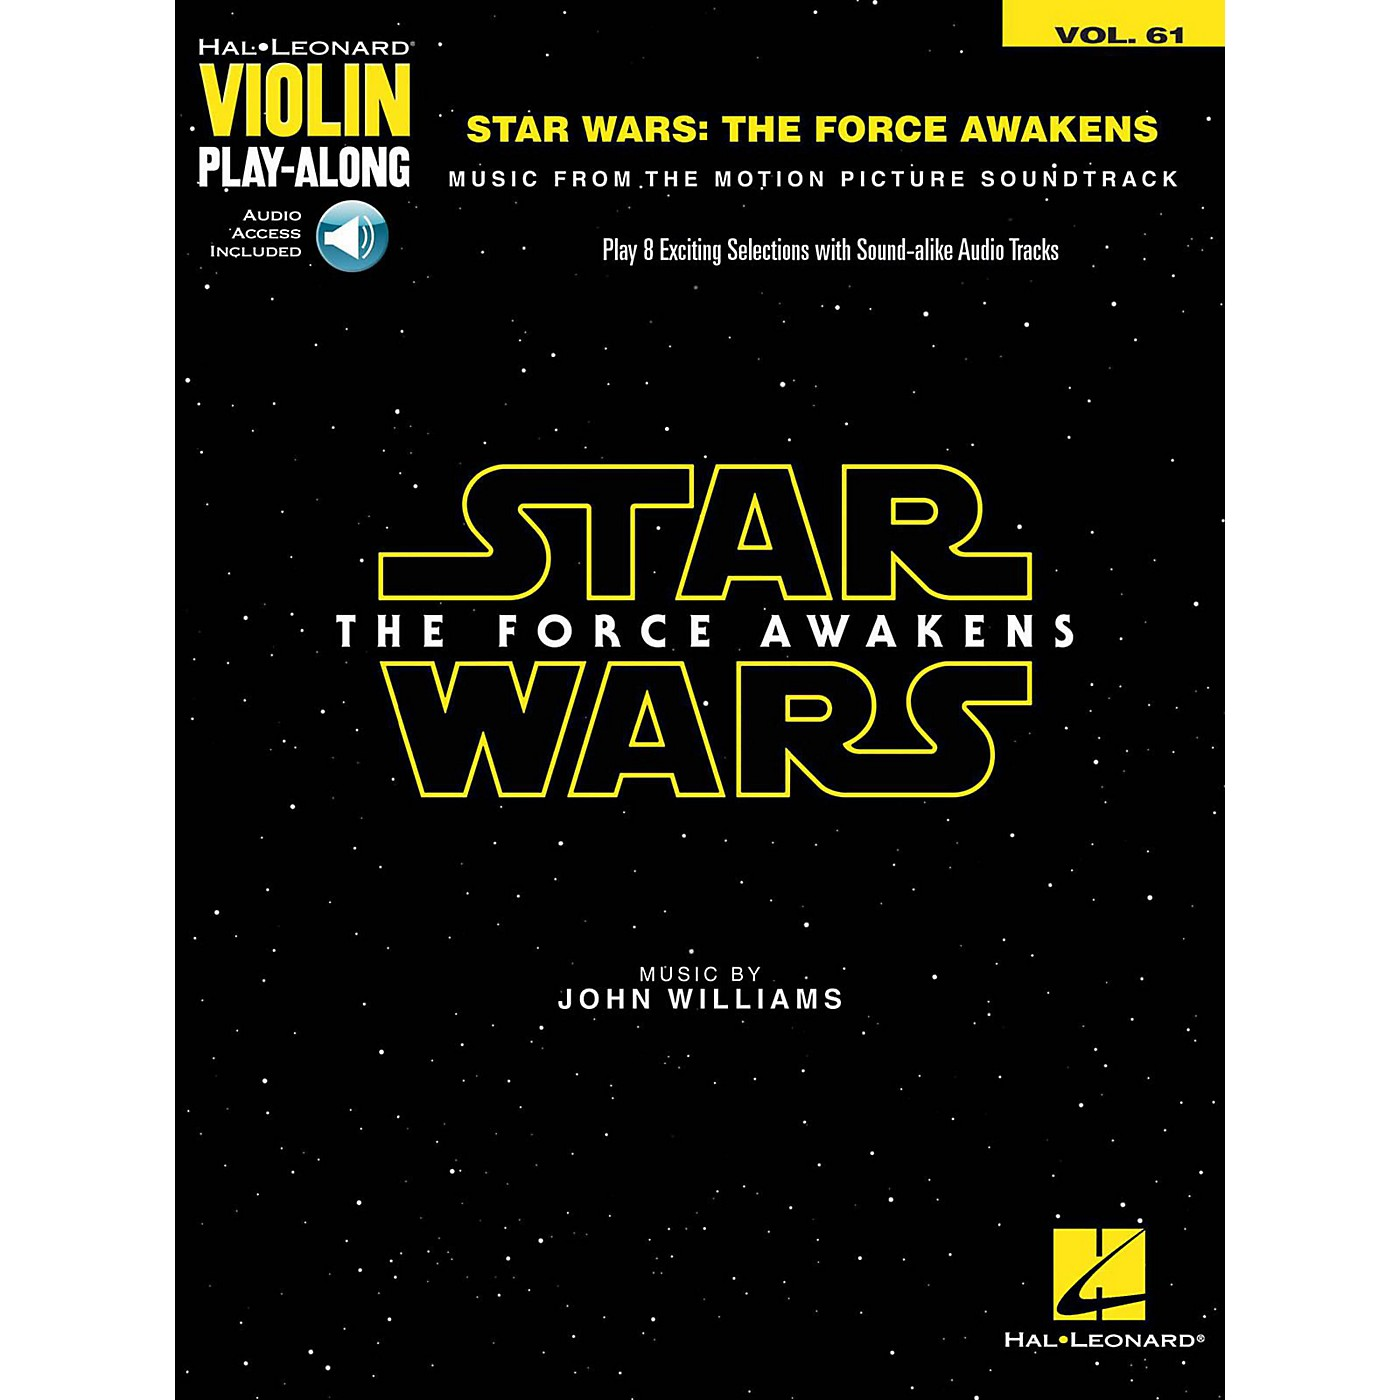 Hal Leonard Star Wars - The Force Awakens Violin Play-Along Volume 61 (Book/Audio Online) thumbnail